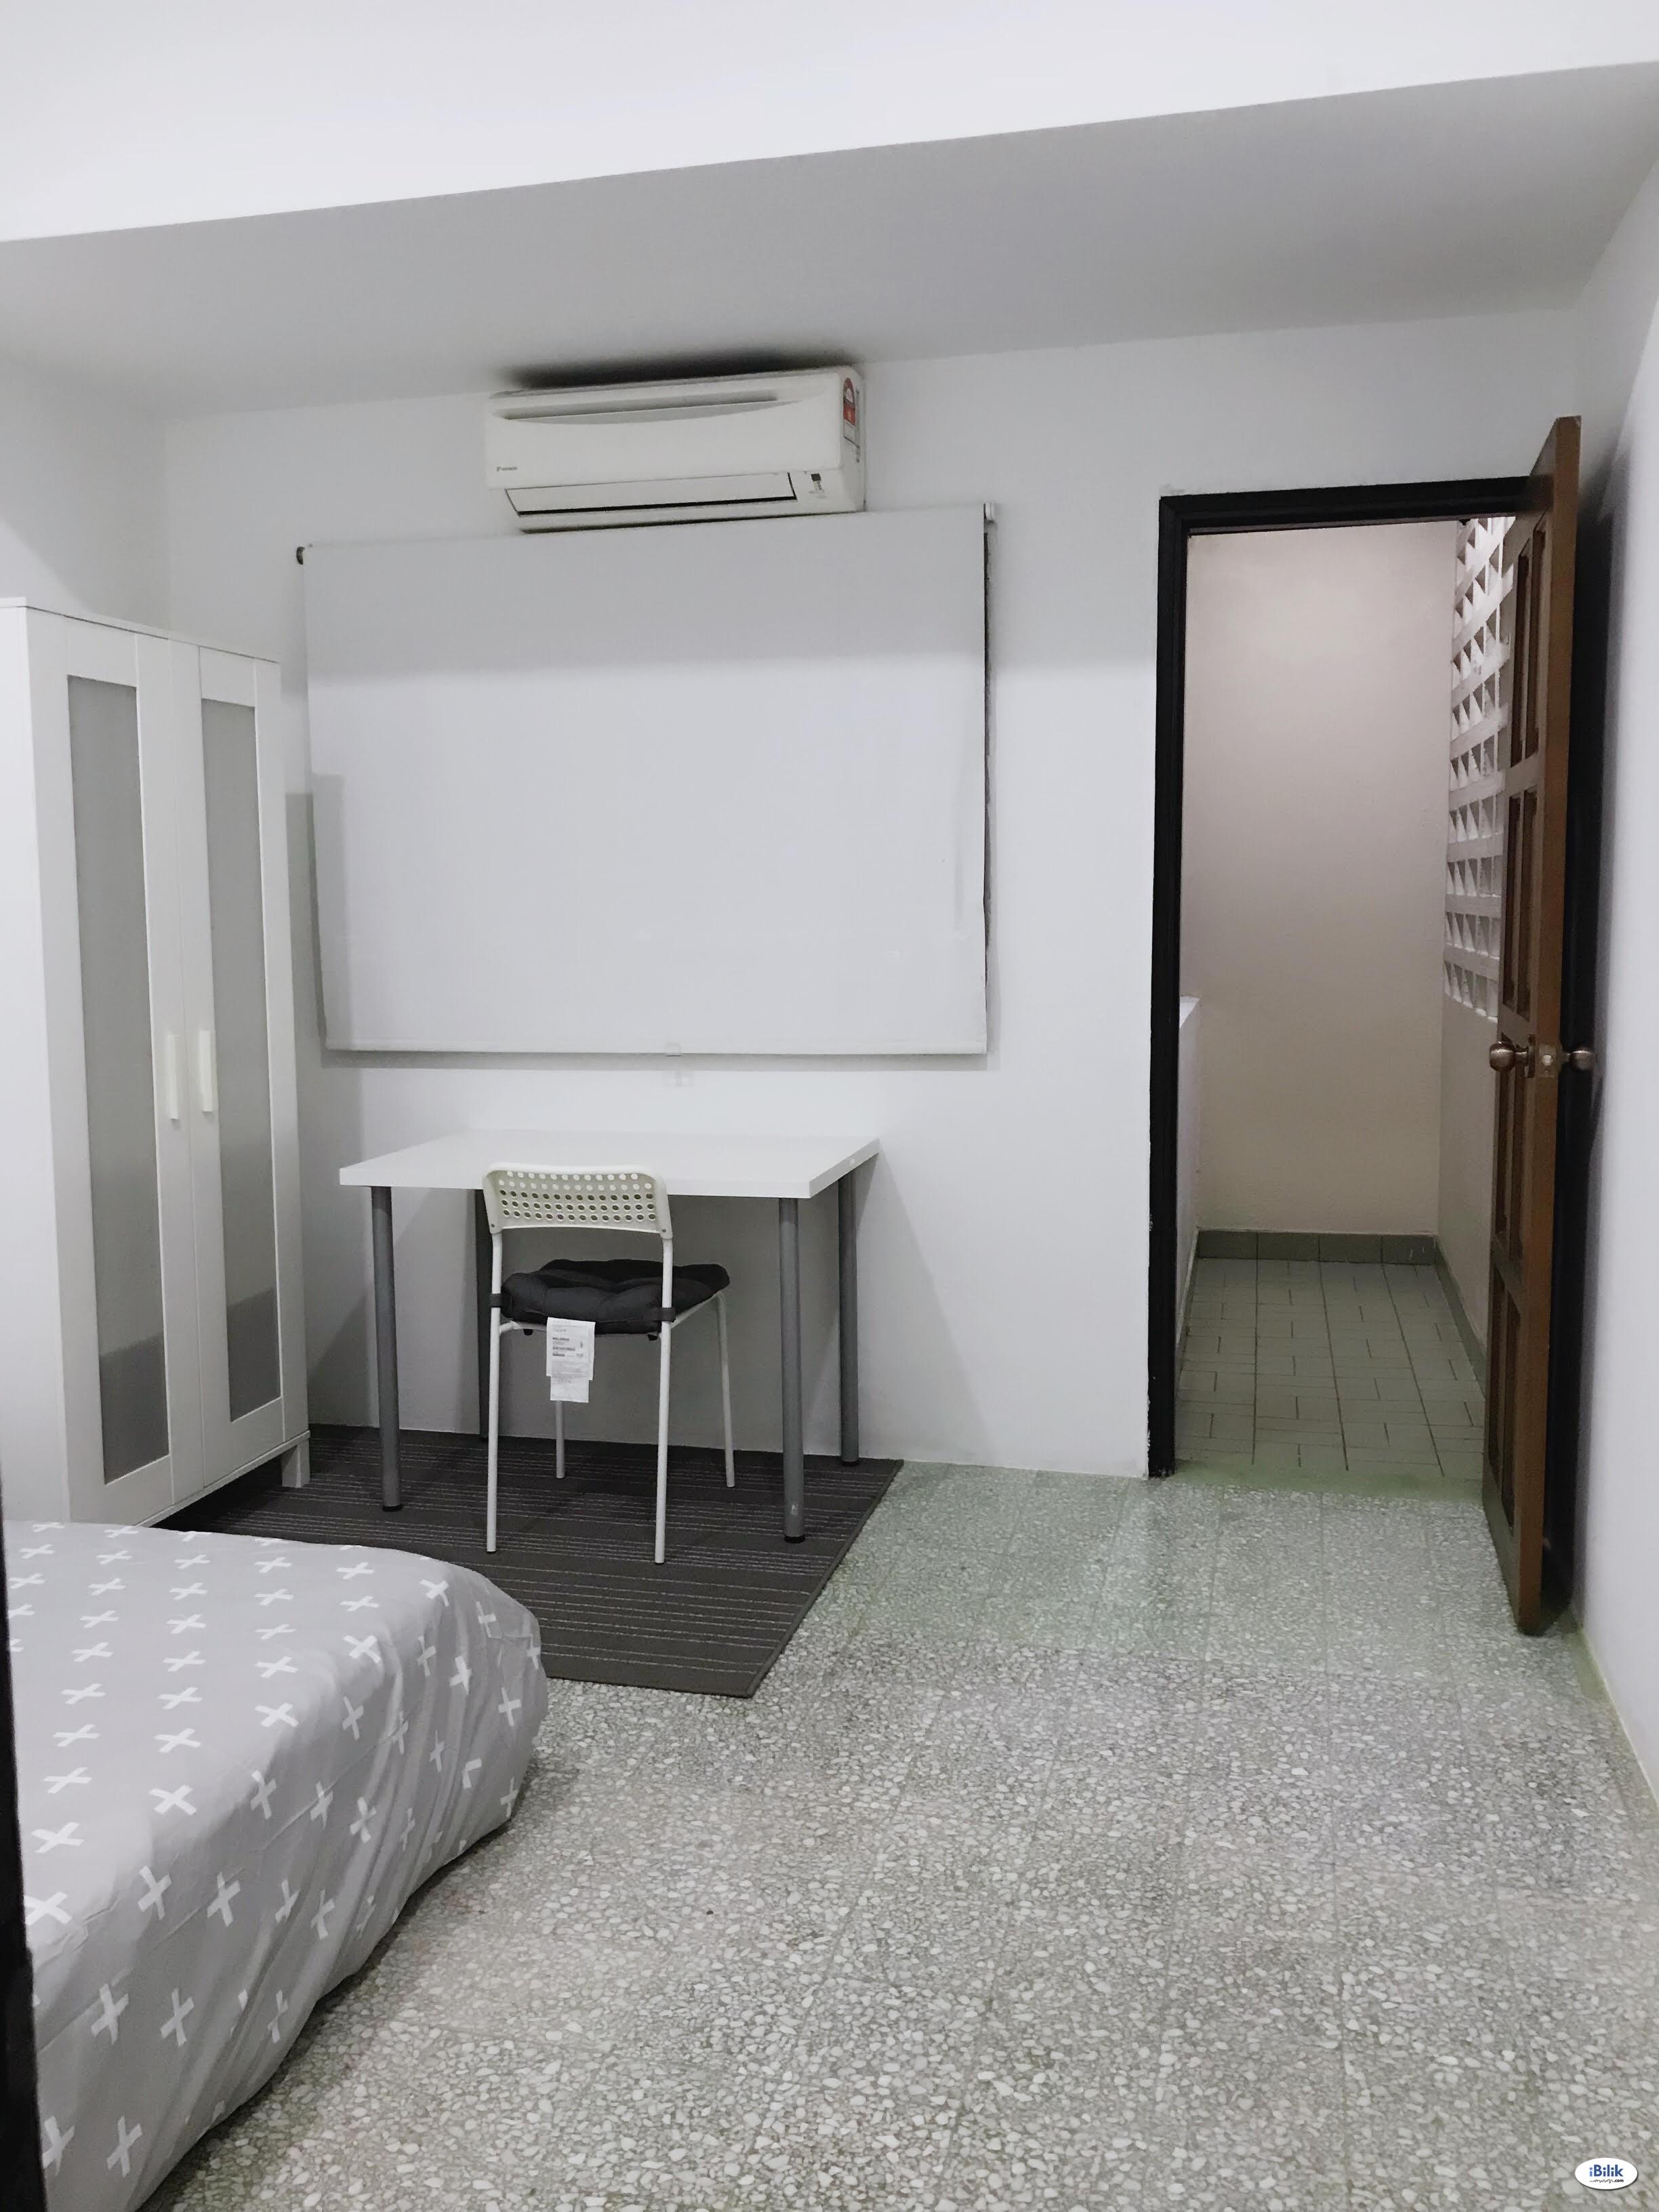 Middle Room at Pudu, KL City Centre